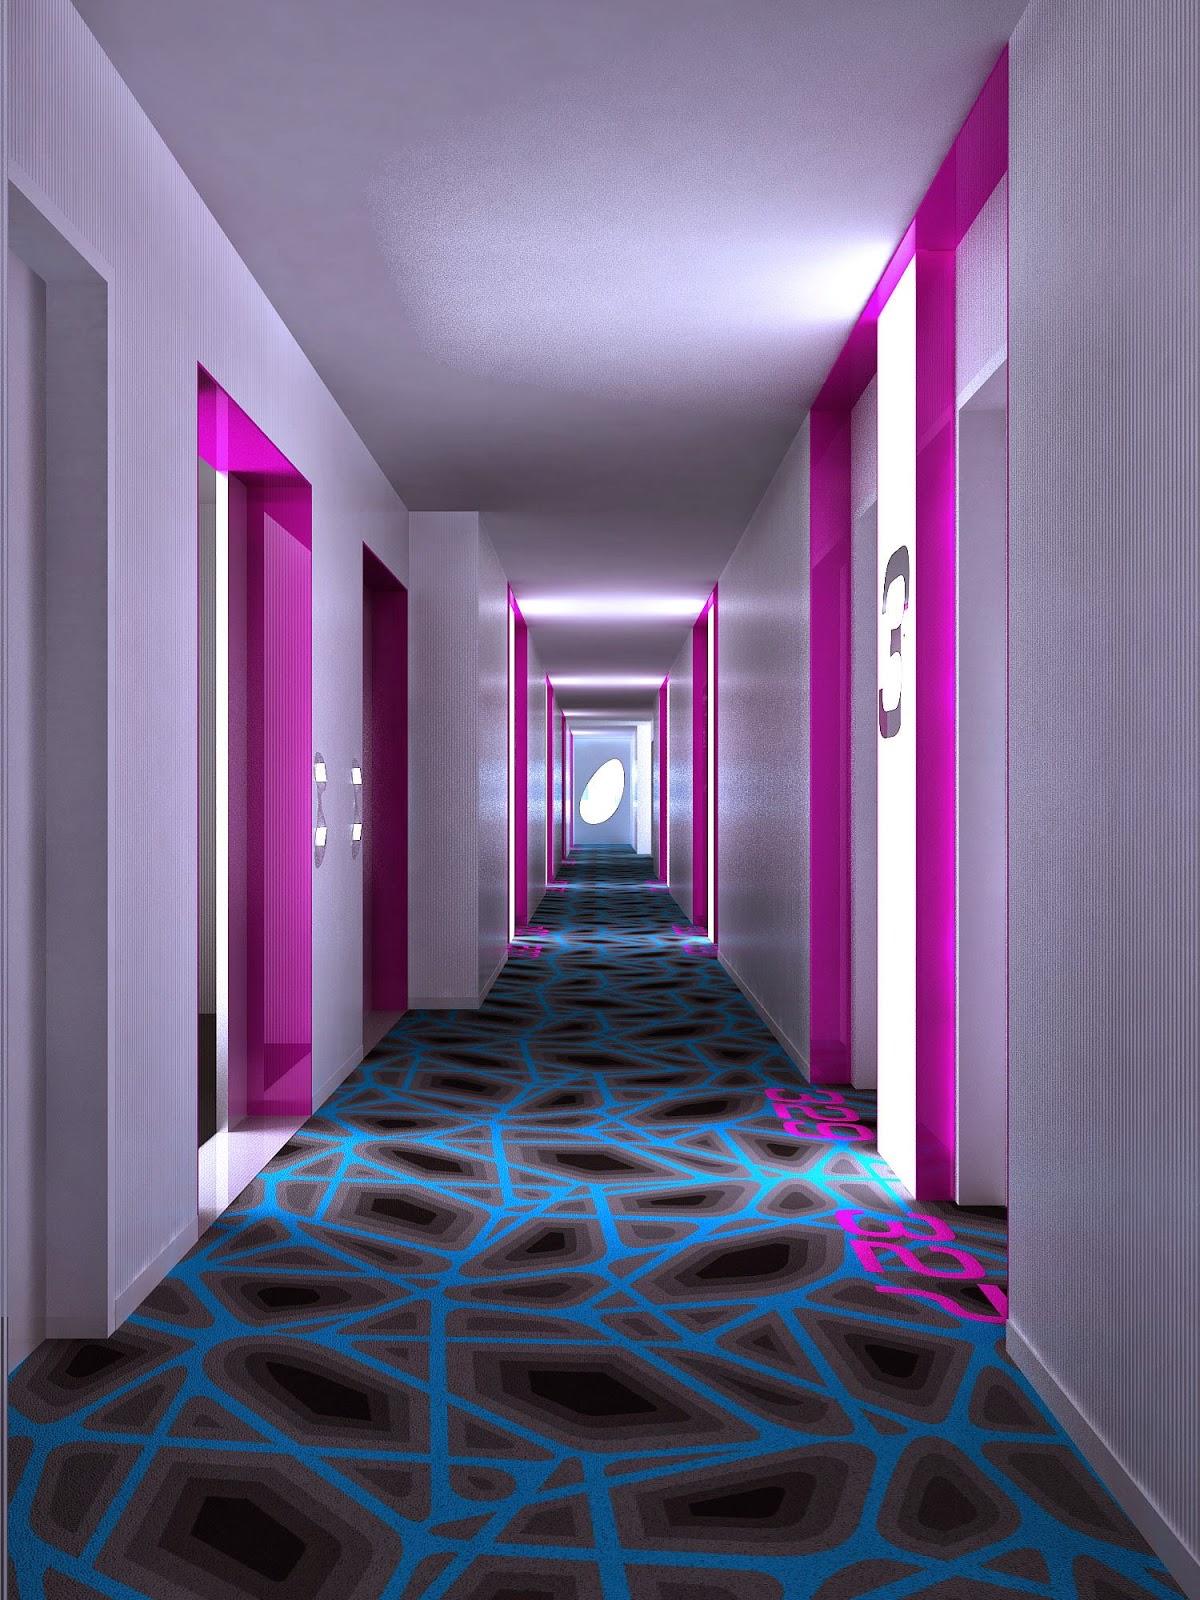 les plus beaux hotels design du monde h tel prizeotel hamburg city by karim rashid hambourg. Black Bedroom Furniture Sets. Home Design Ideas